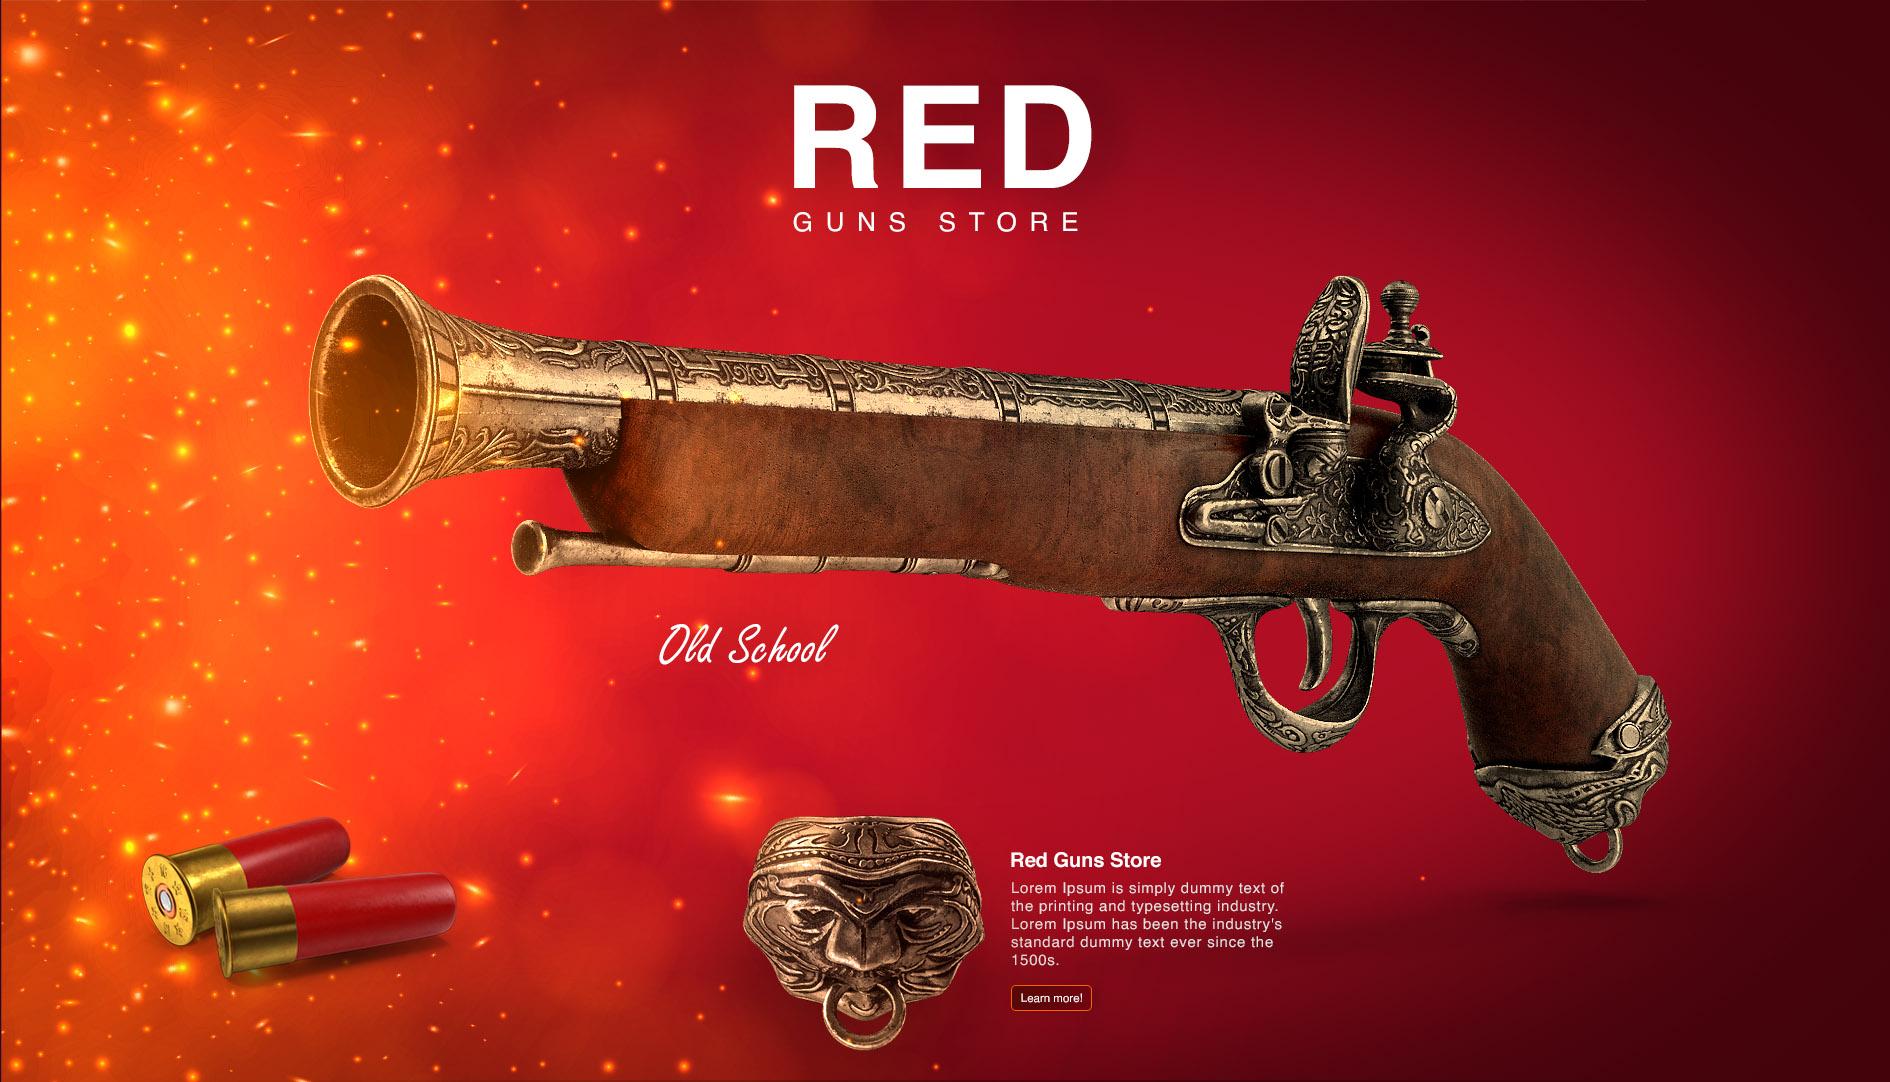 red-guns-store-website-design1-waleedsayed